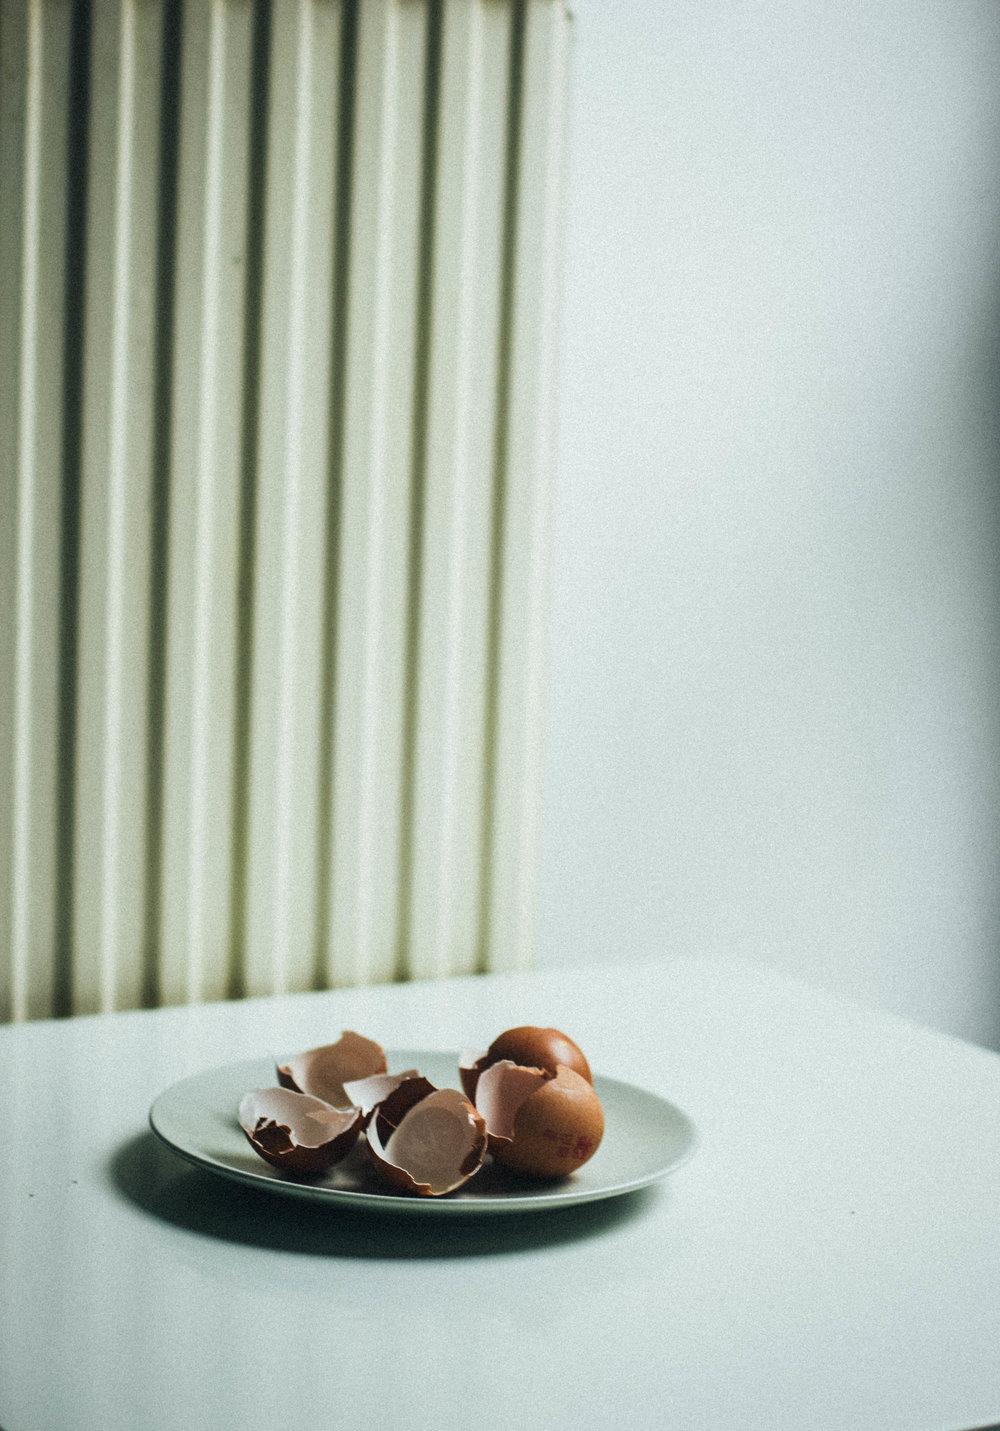 chocolate a.s.c 7-1.jpg